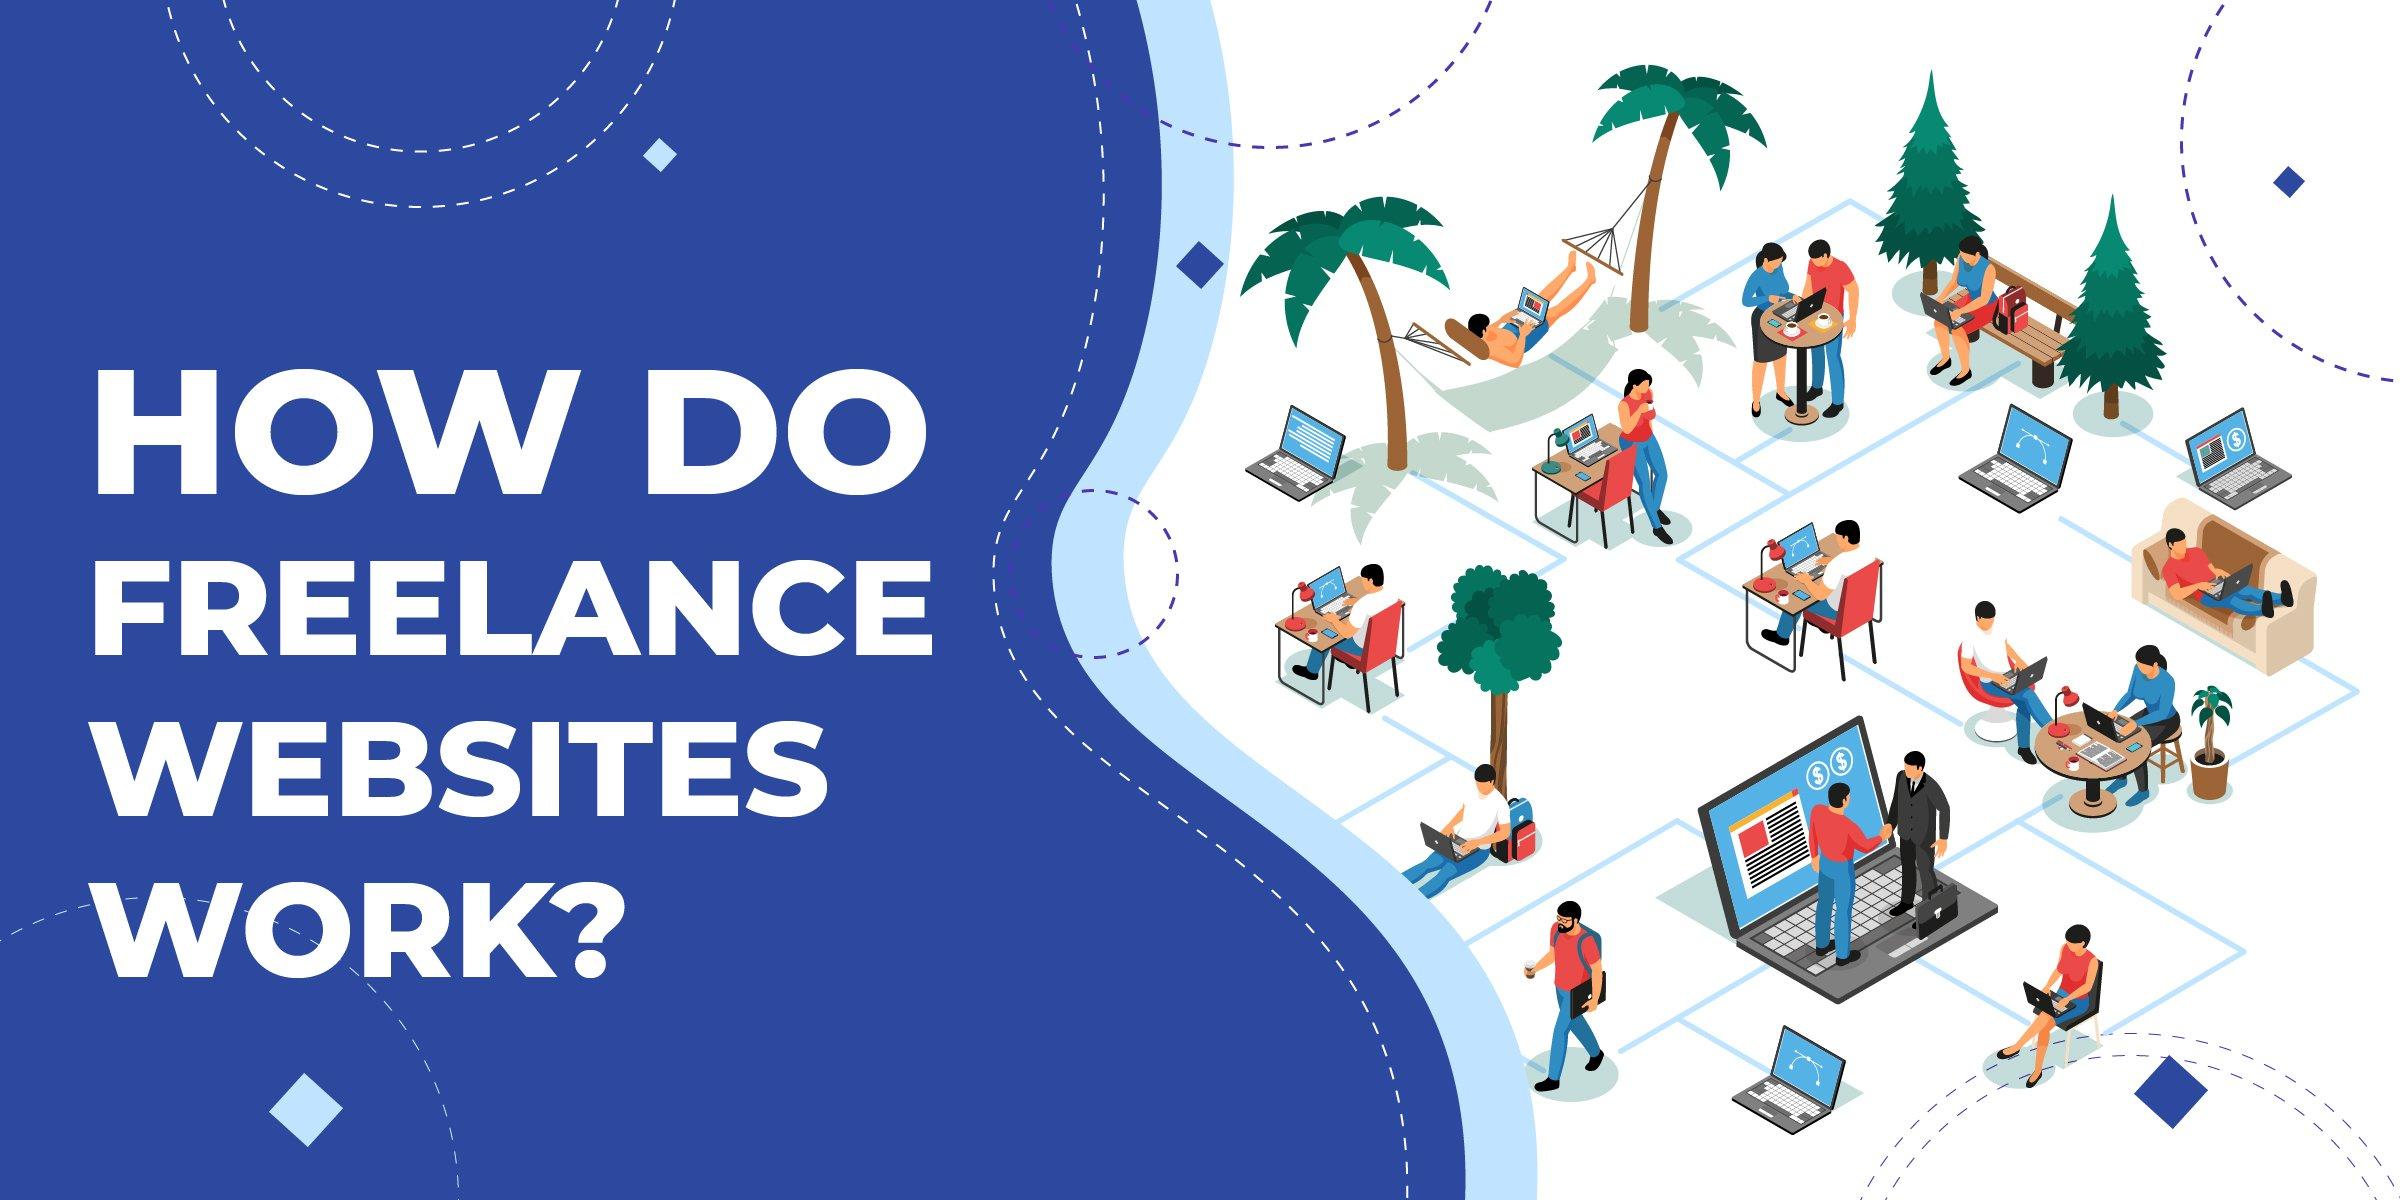 How Do Freelance Websites Work?